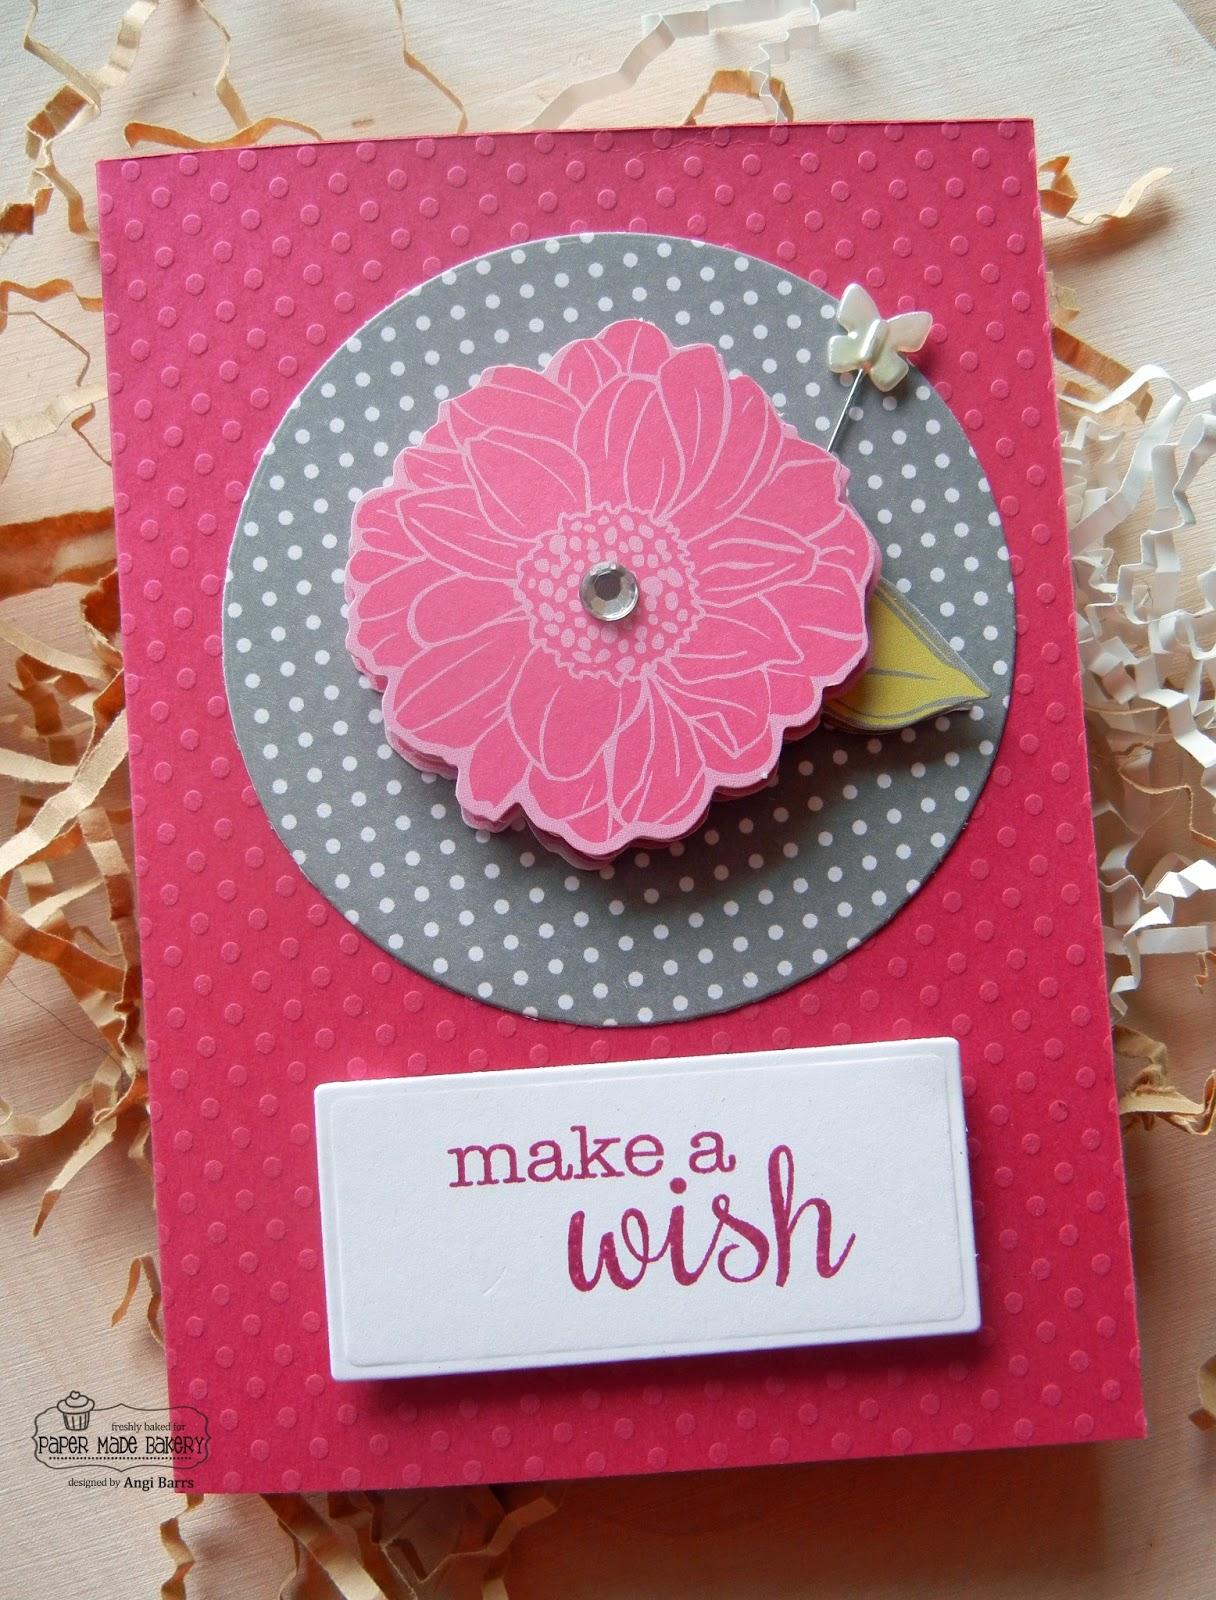 Paper made bakery girly birthday cards girly birthday cards izmirmasajfo